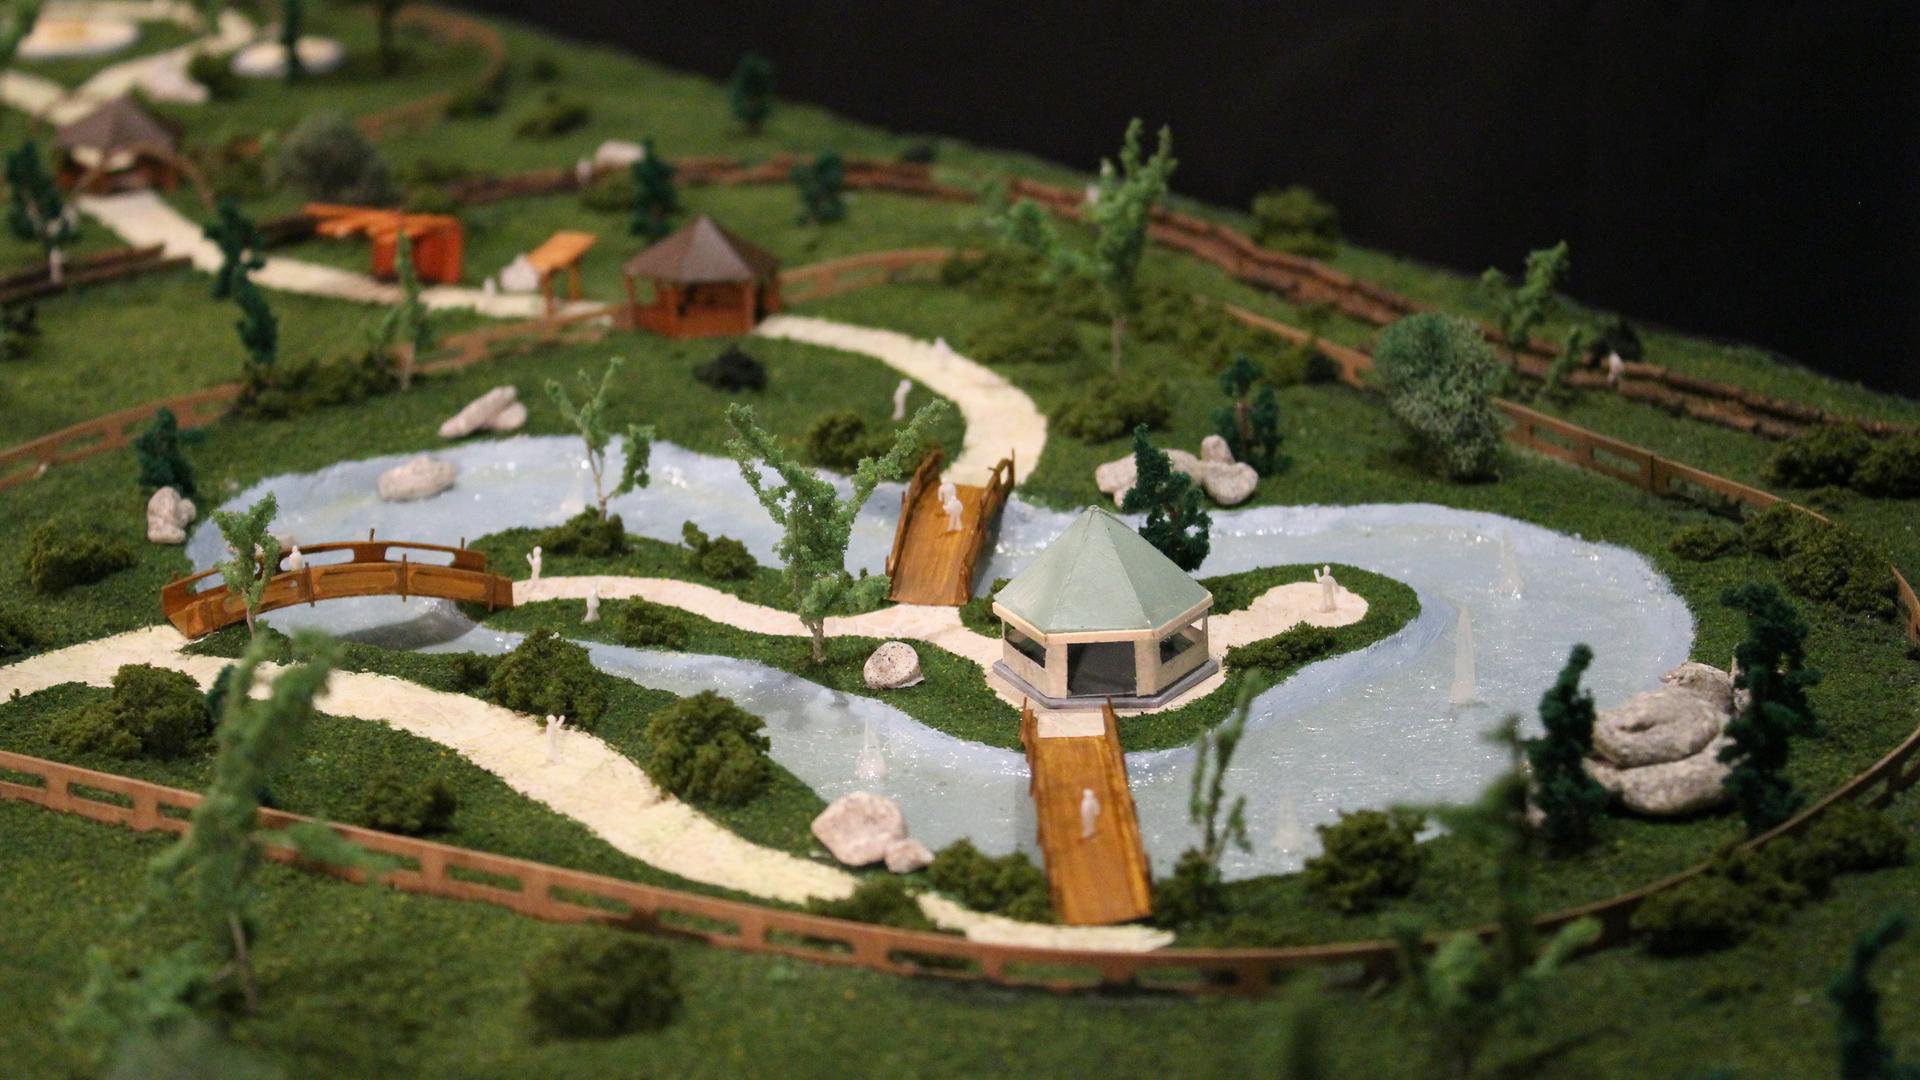 Goddard's Grotto